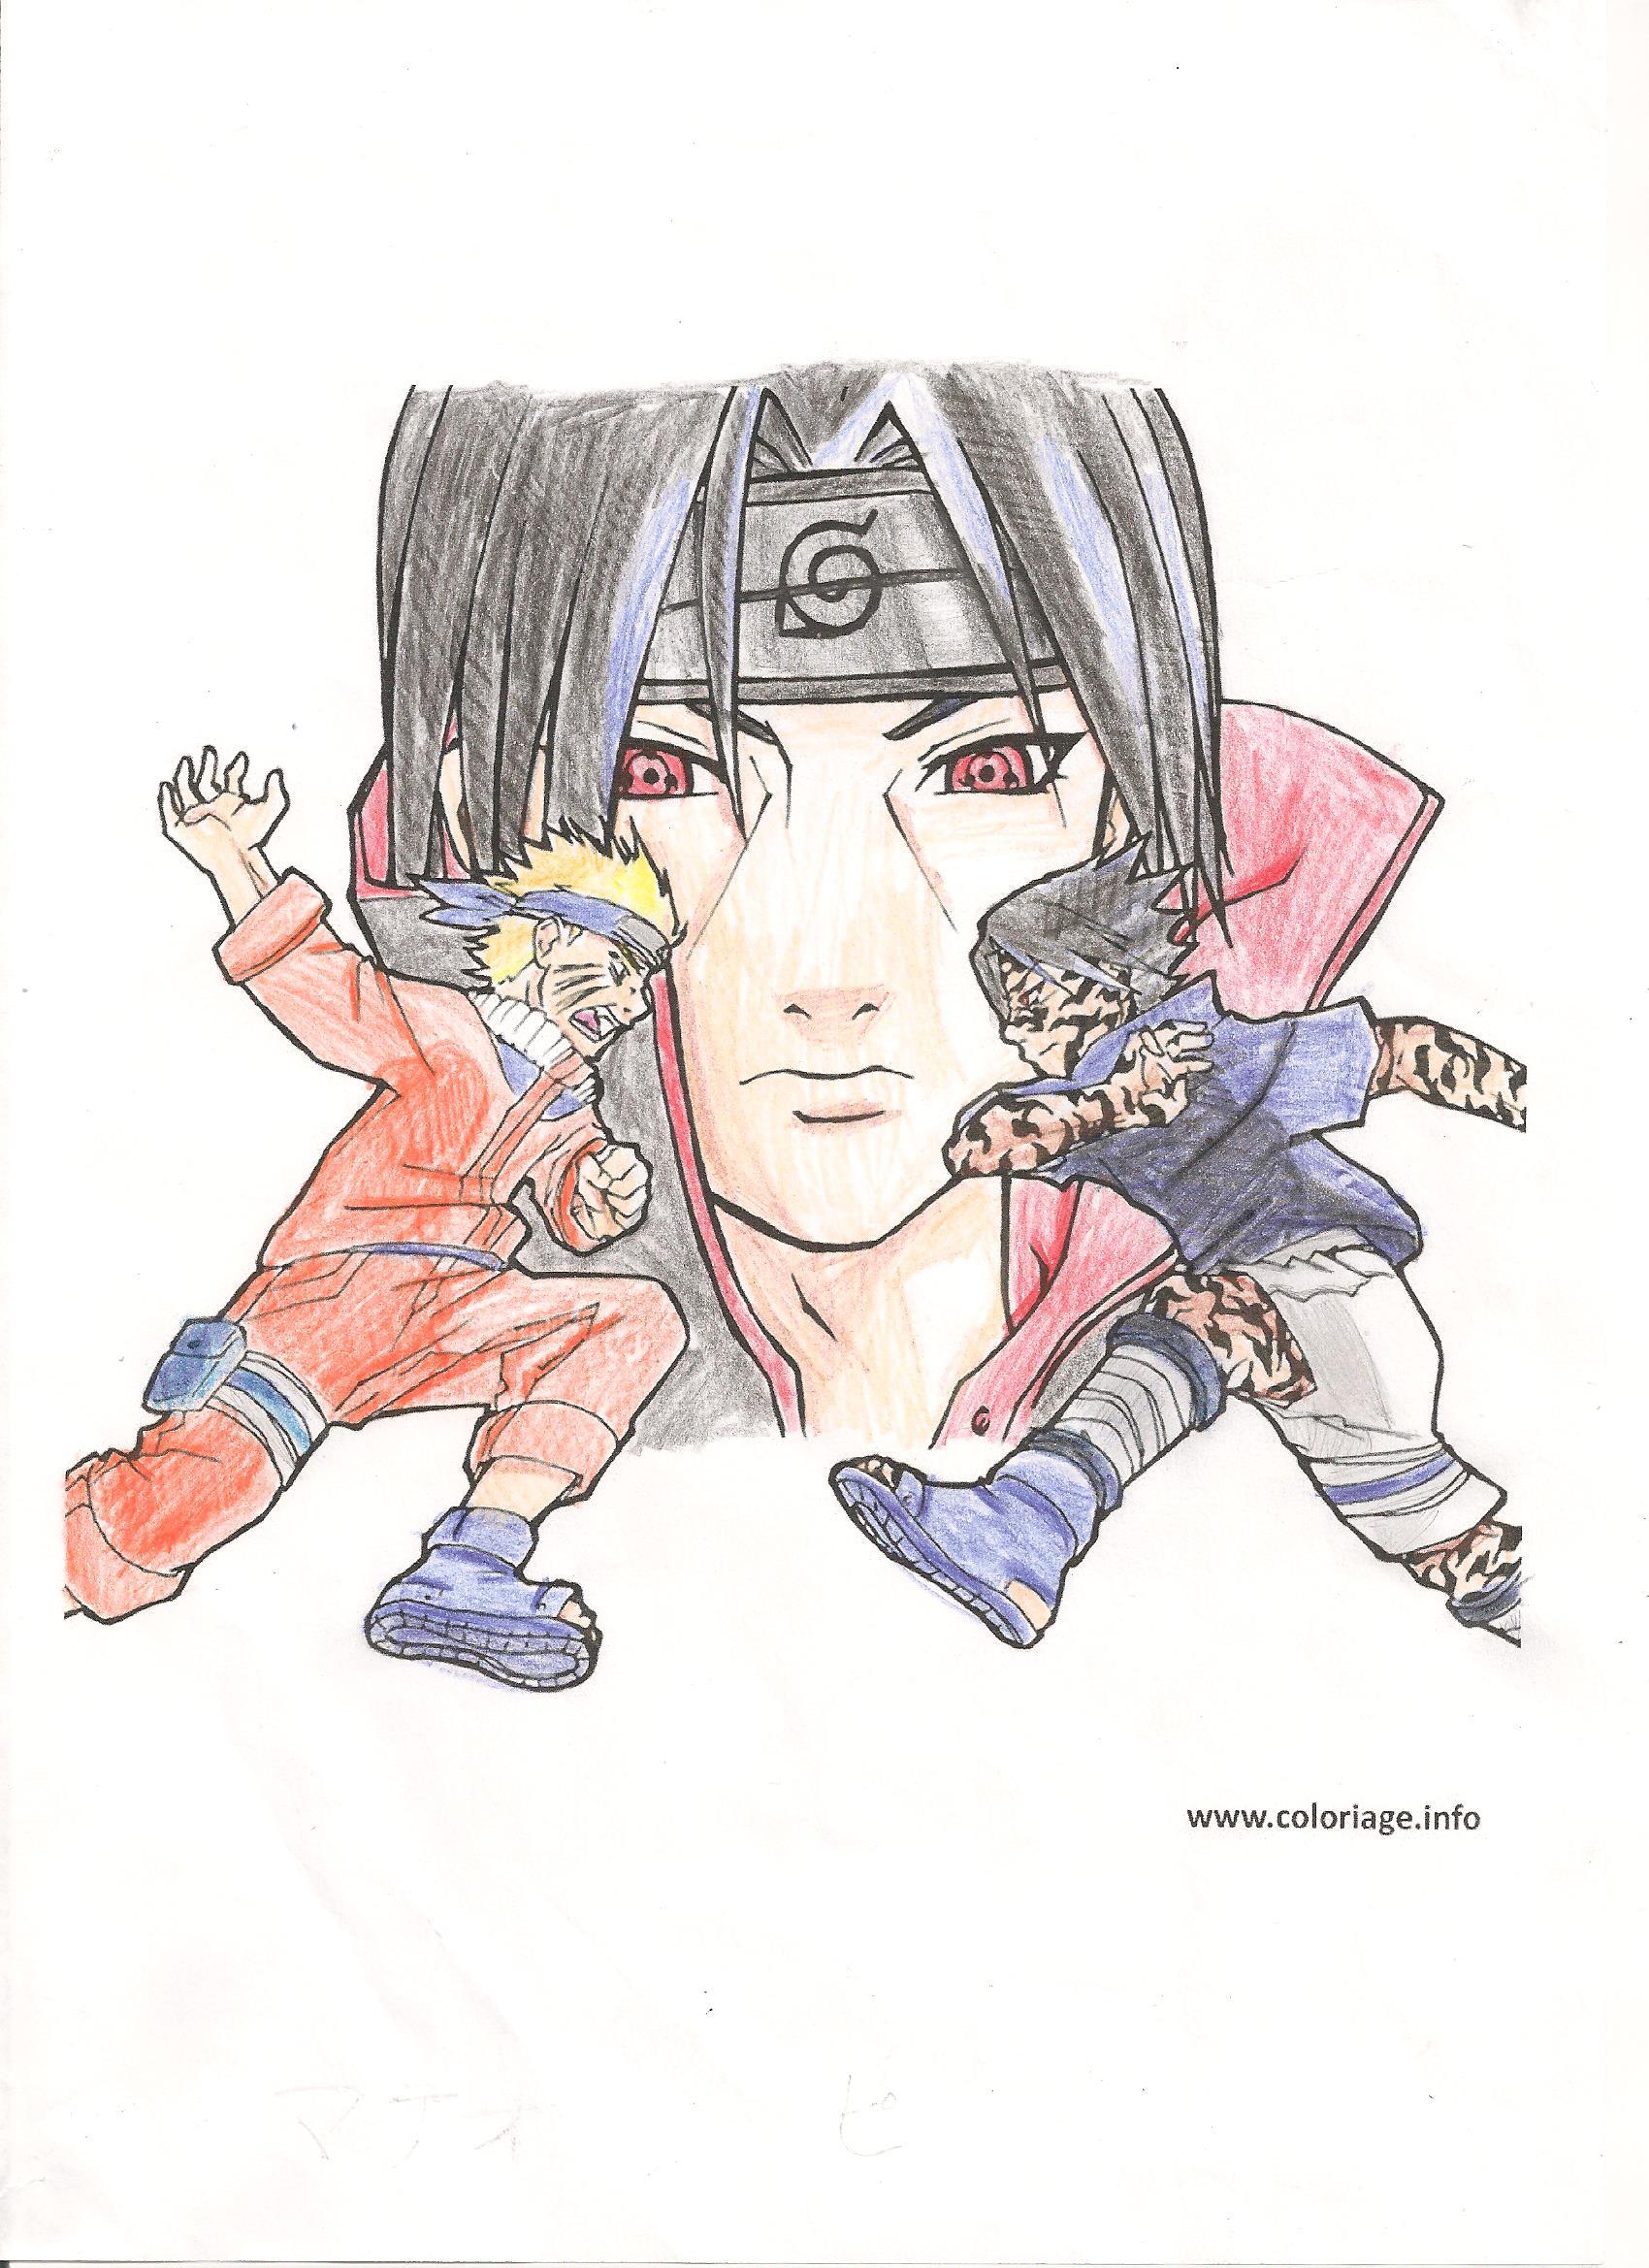 Dessin Naruto Et Sasuke destiné Coloriage Naruto Sasuke